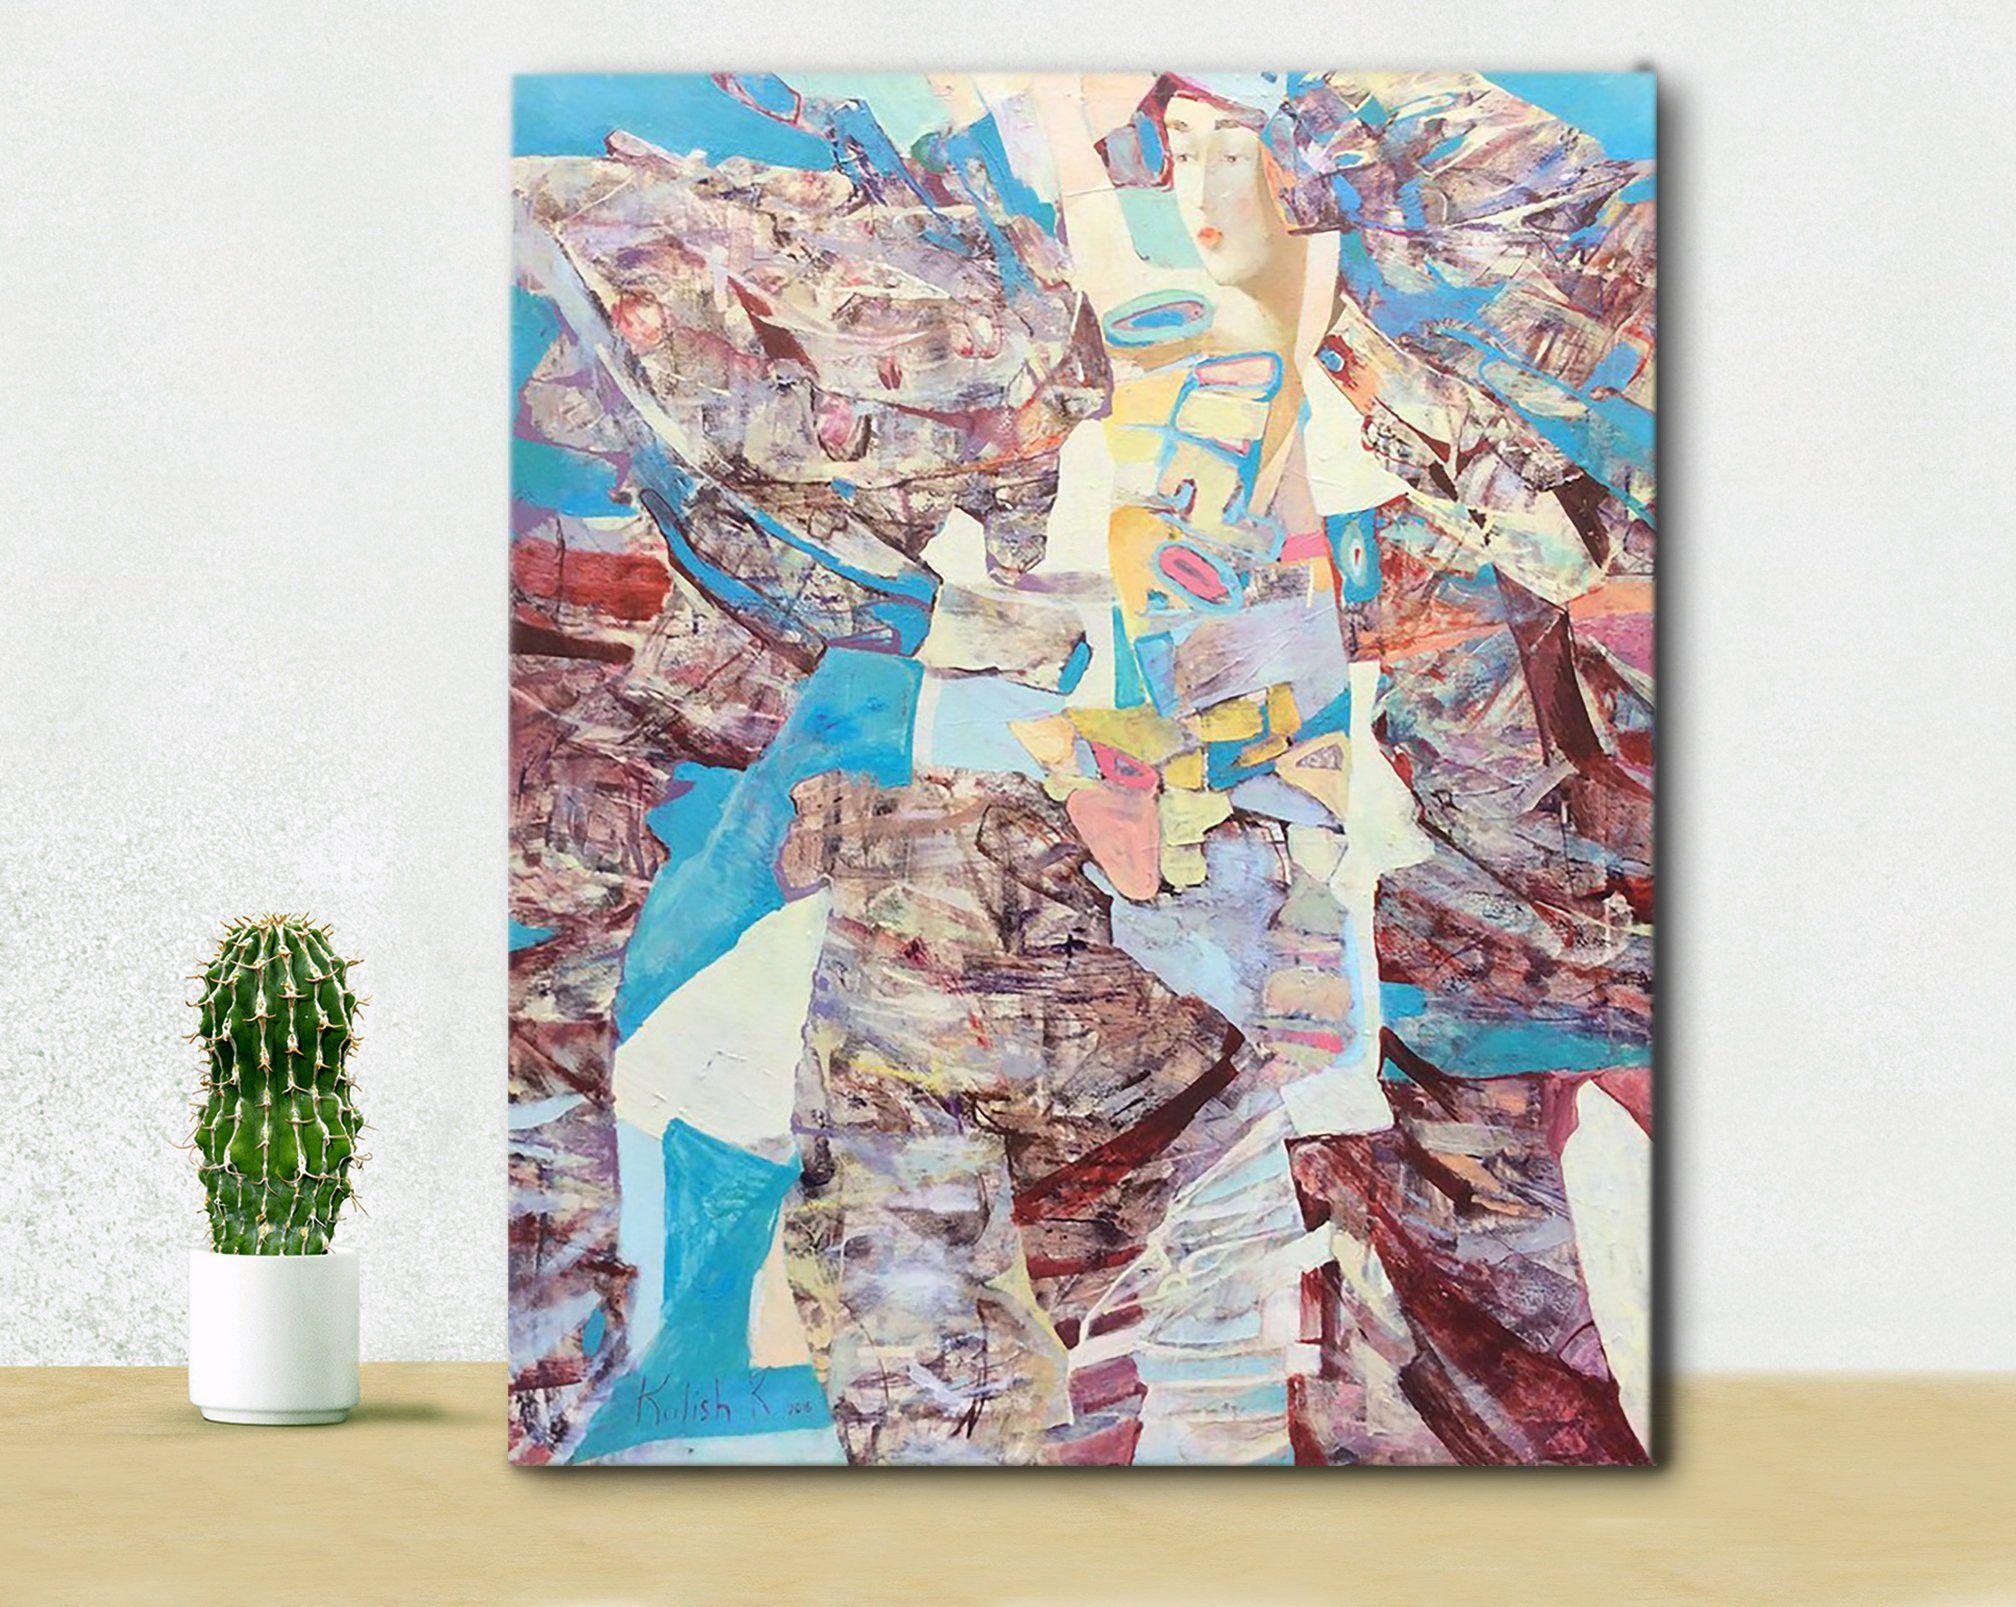 Oil woman painting canvas wall art modern decor blue abstract art